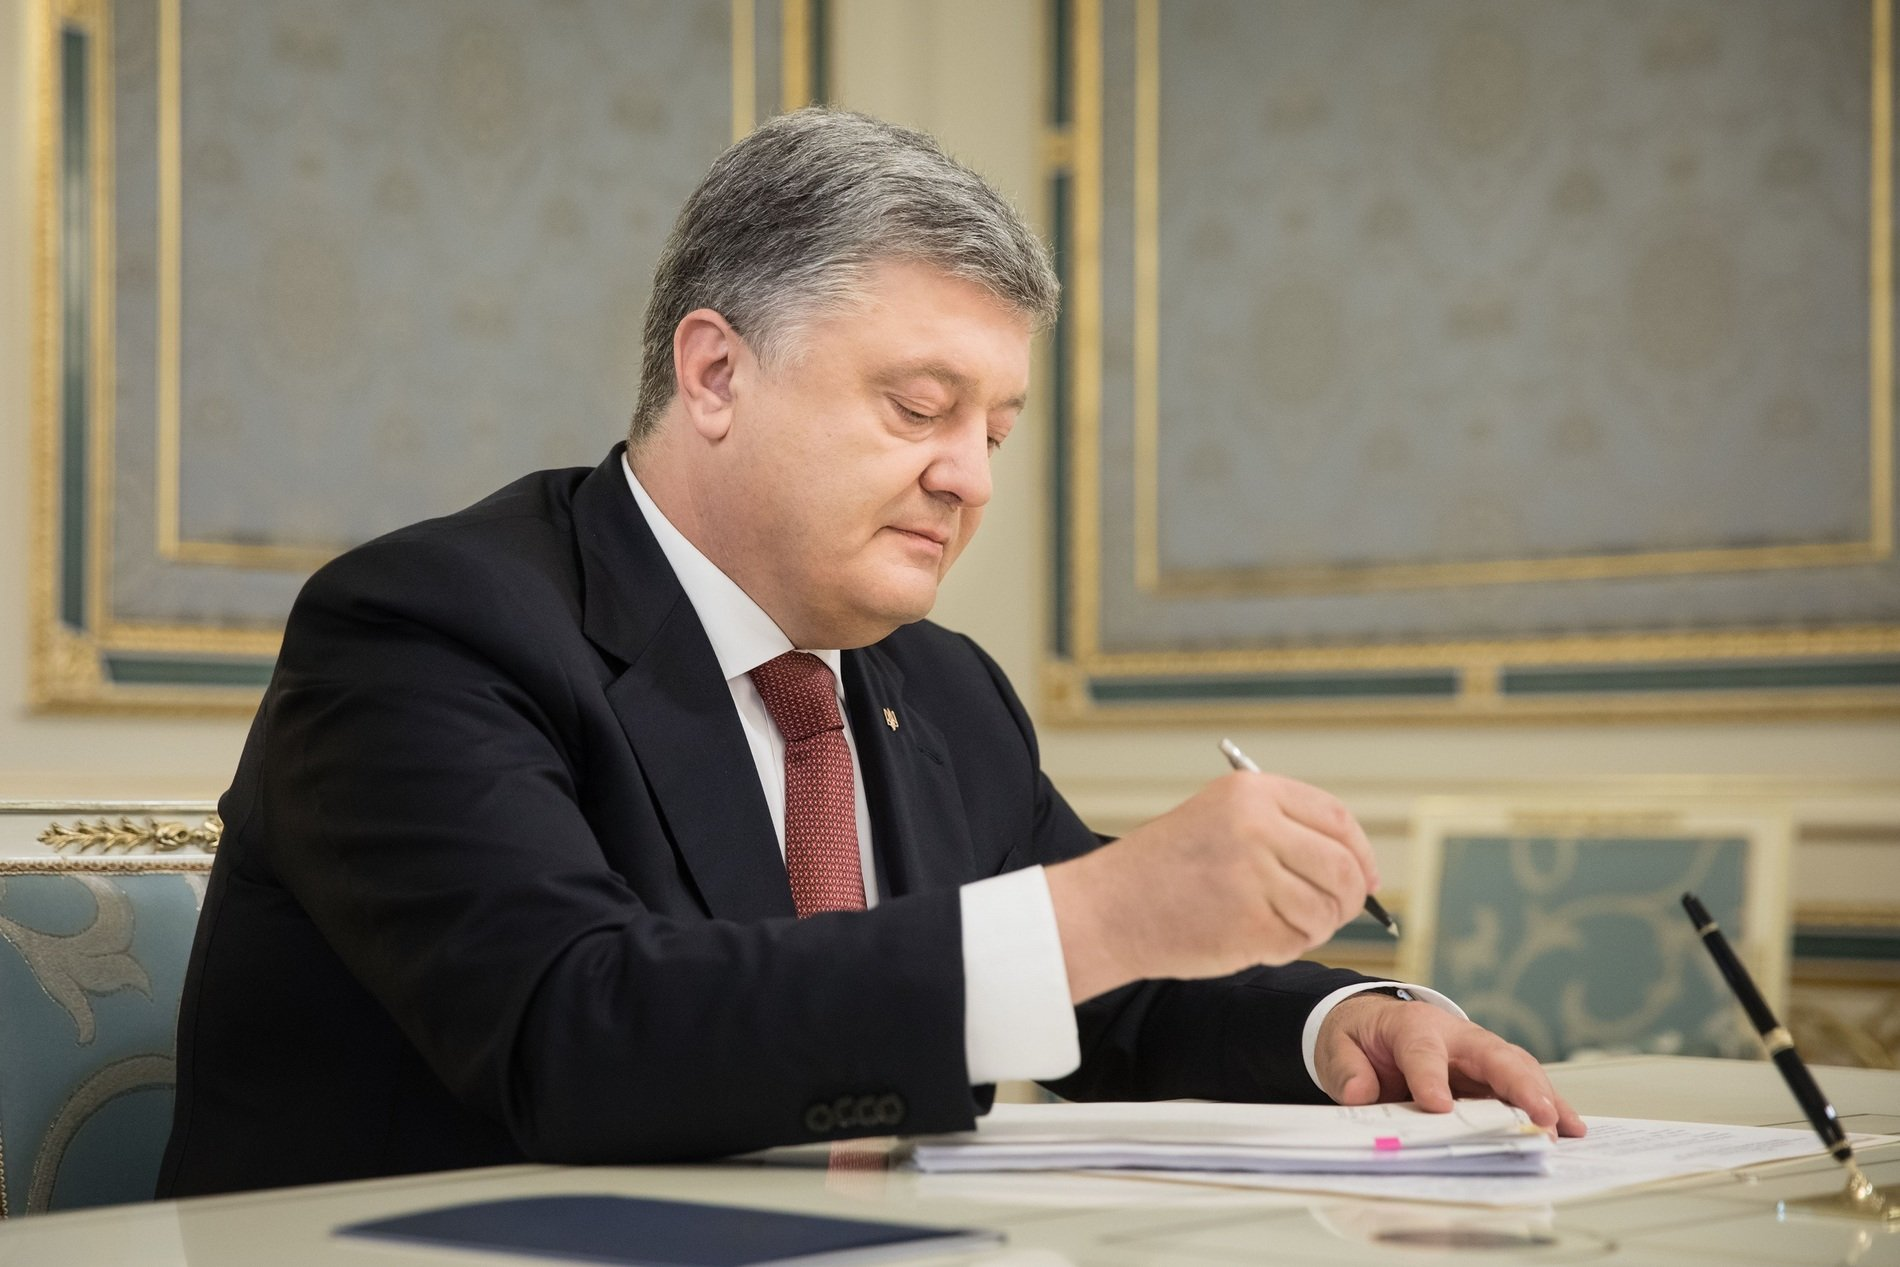 Порошенко підписав указ про виплату грошової винагороди Героям України - today.ua